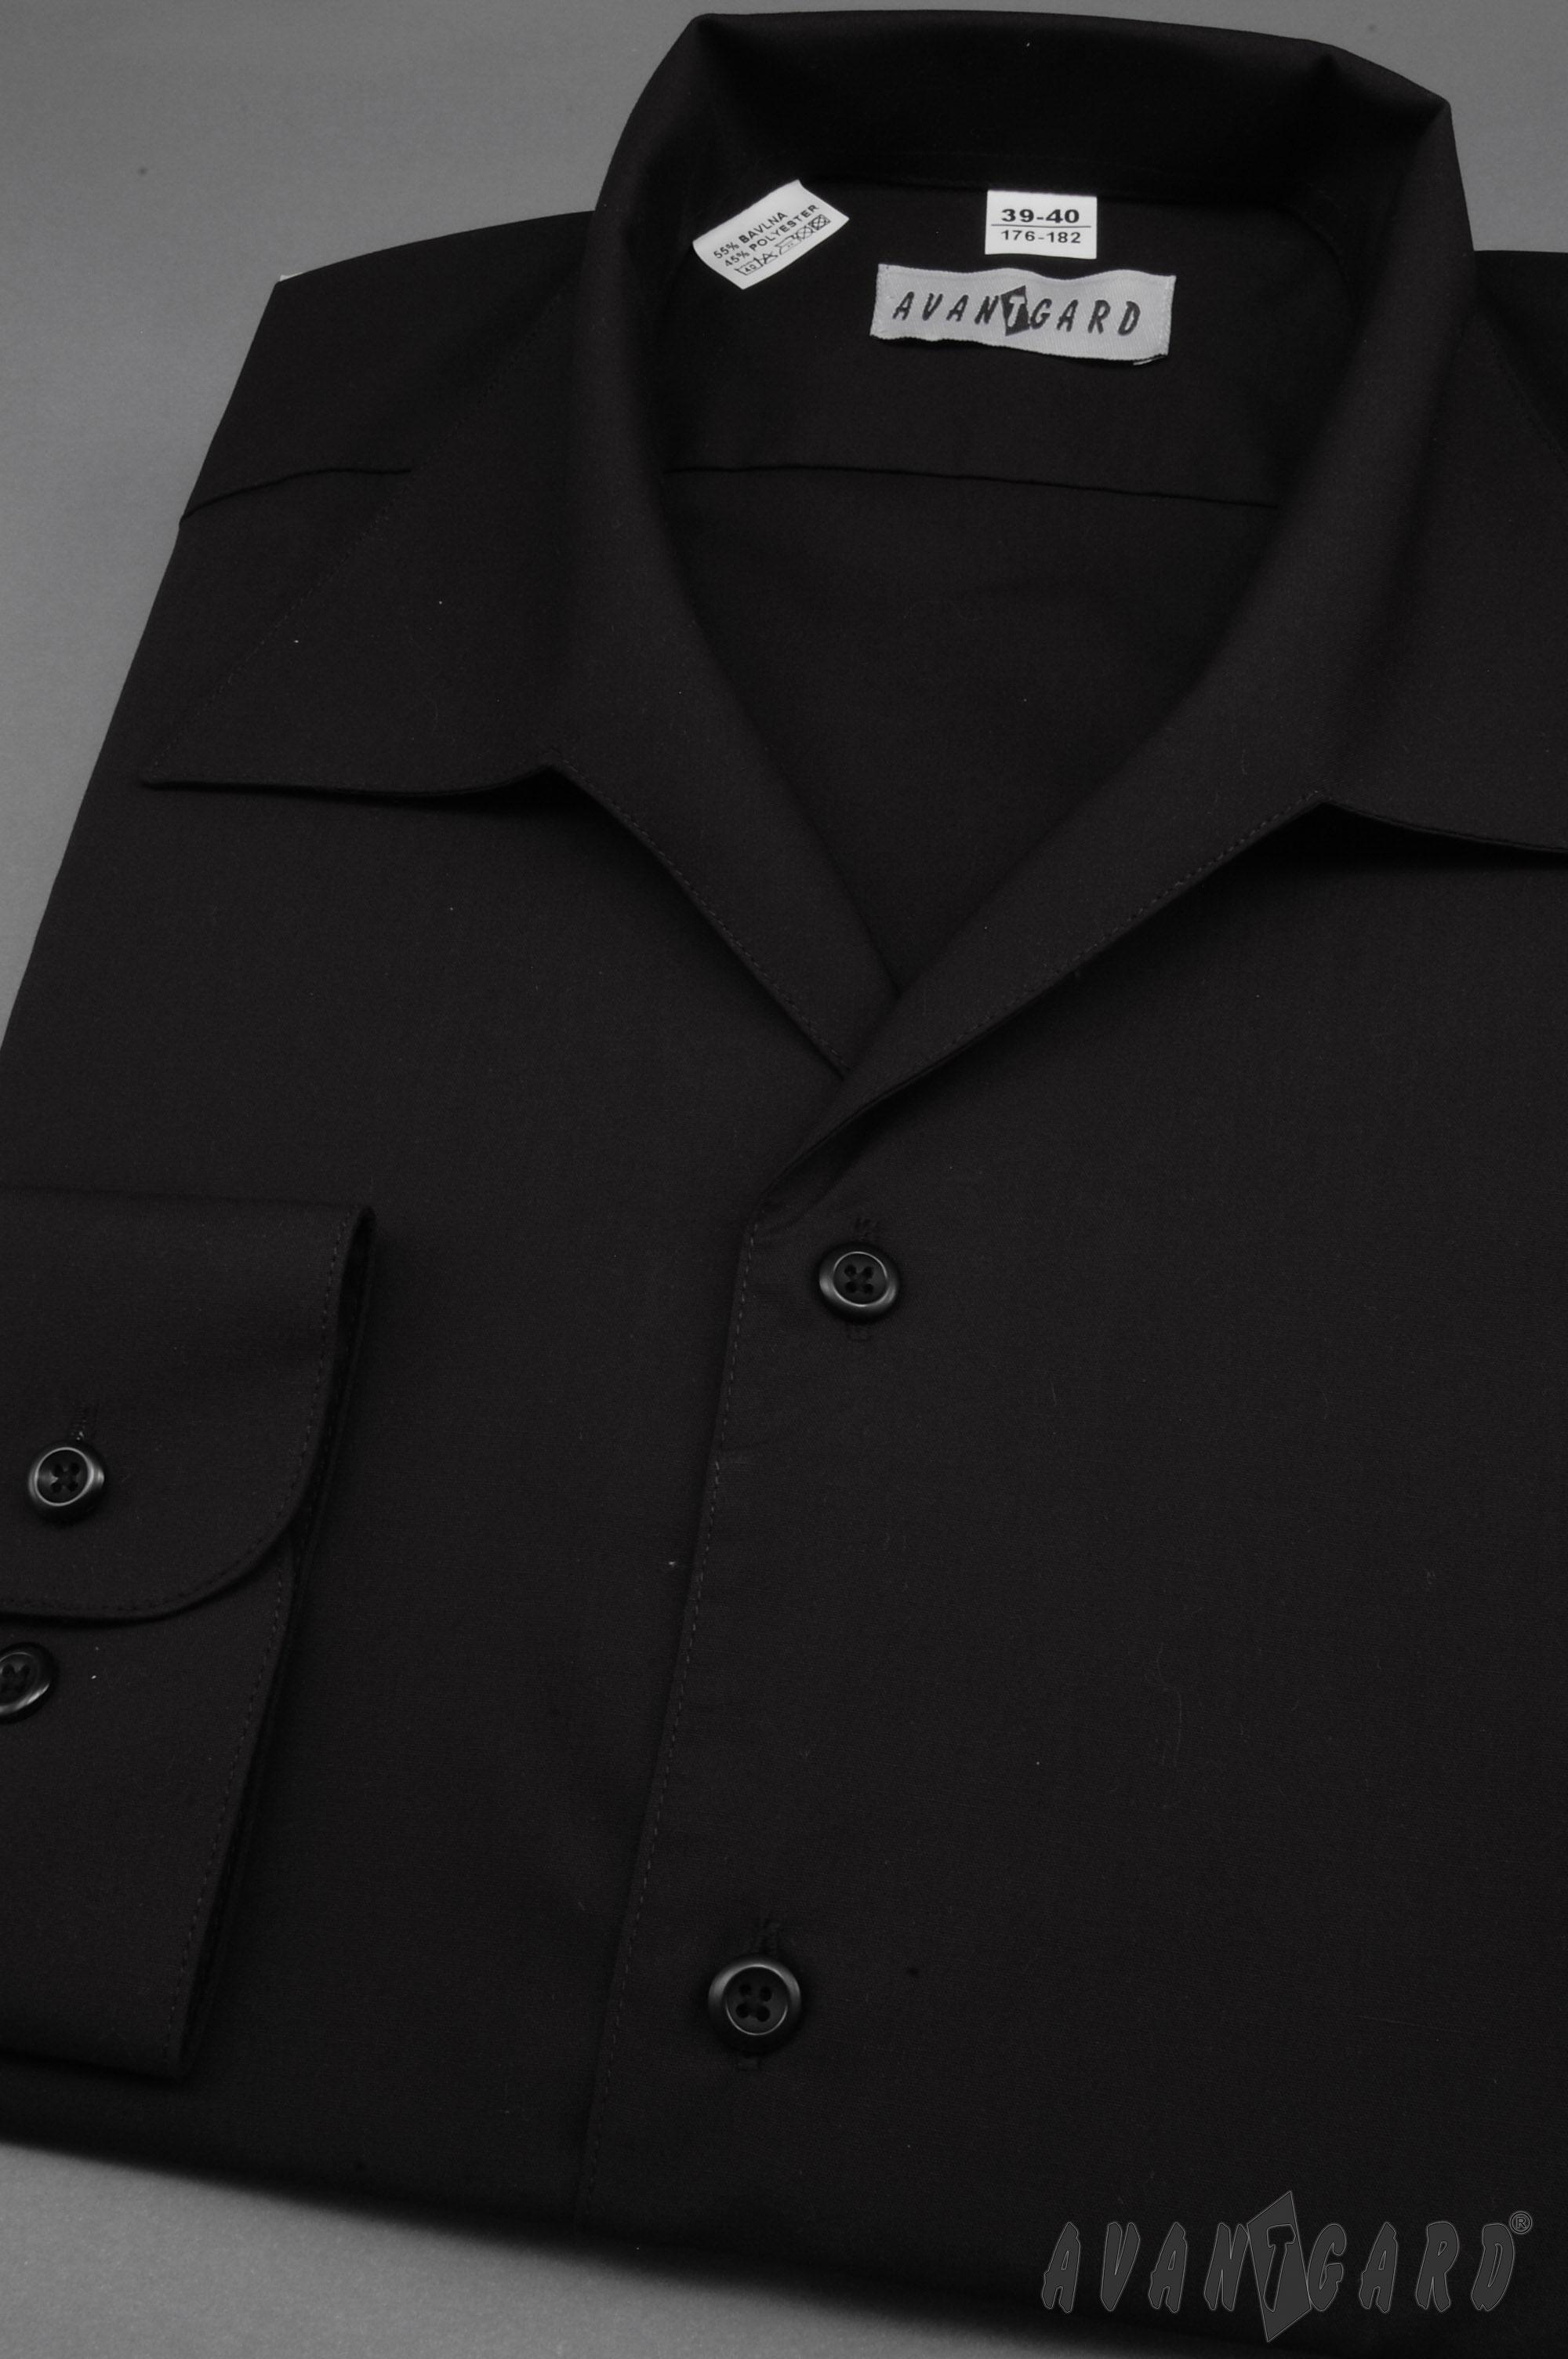 Avantgard pánská košile rozhalenka dlouhý rukáv 457-23 barva černá c1cc3db36e